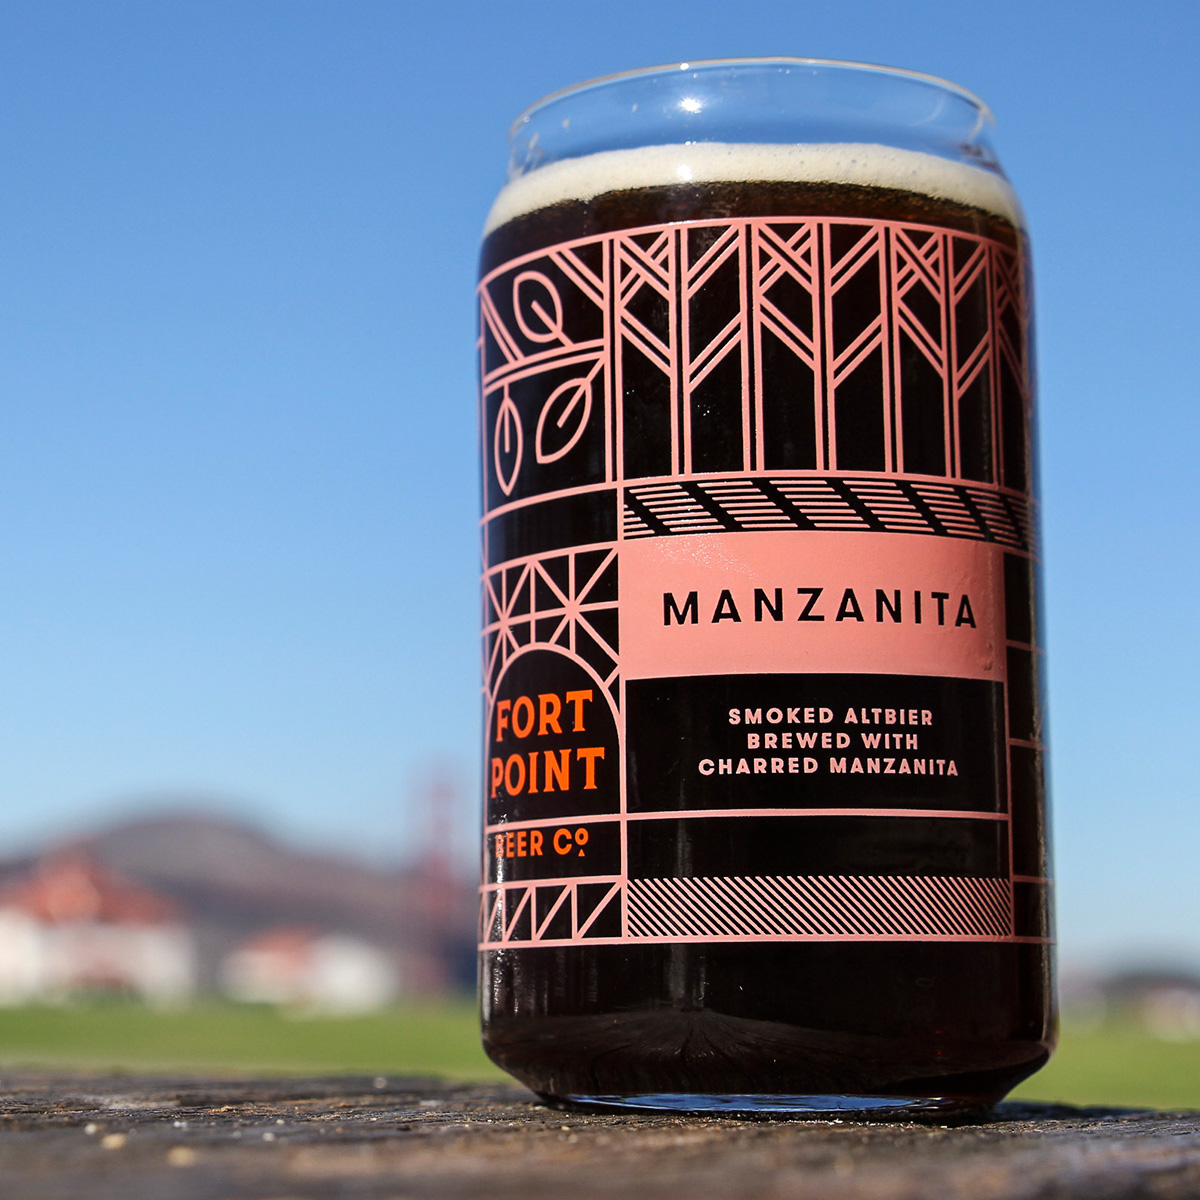 manzanita smoked altbier